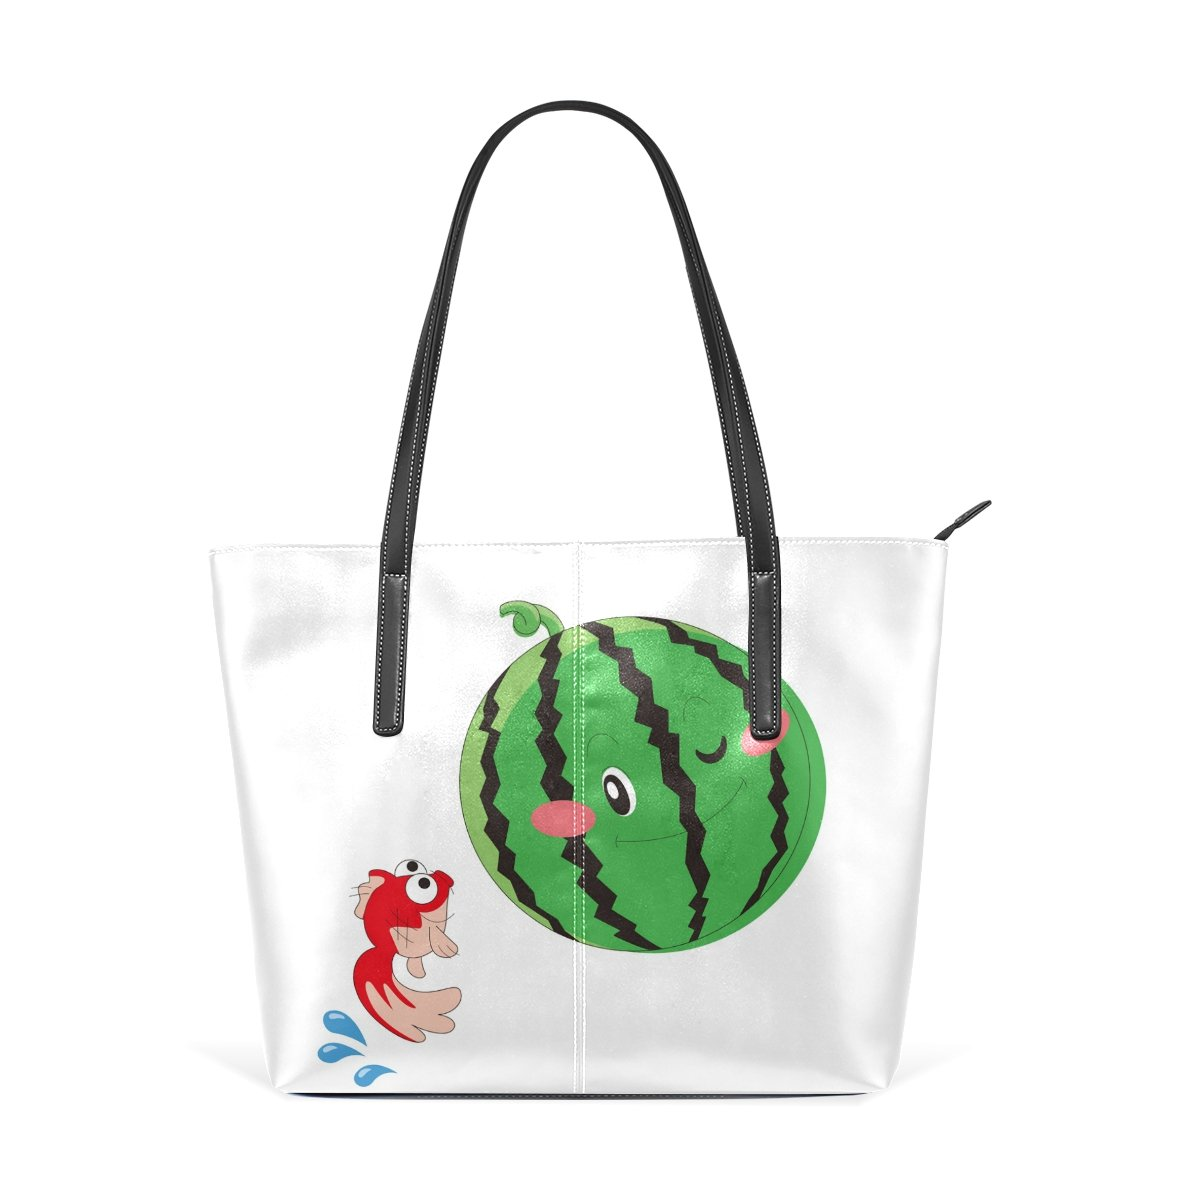 Women Leather Handbags Fish Watermelon Top Handle Shoulder Bags